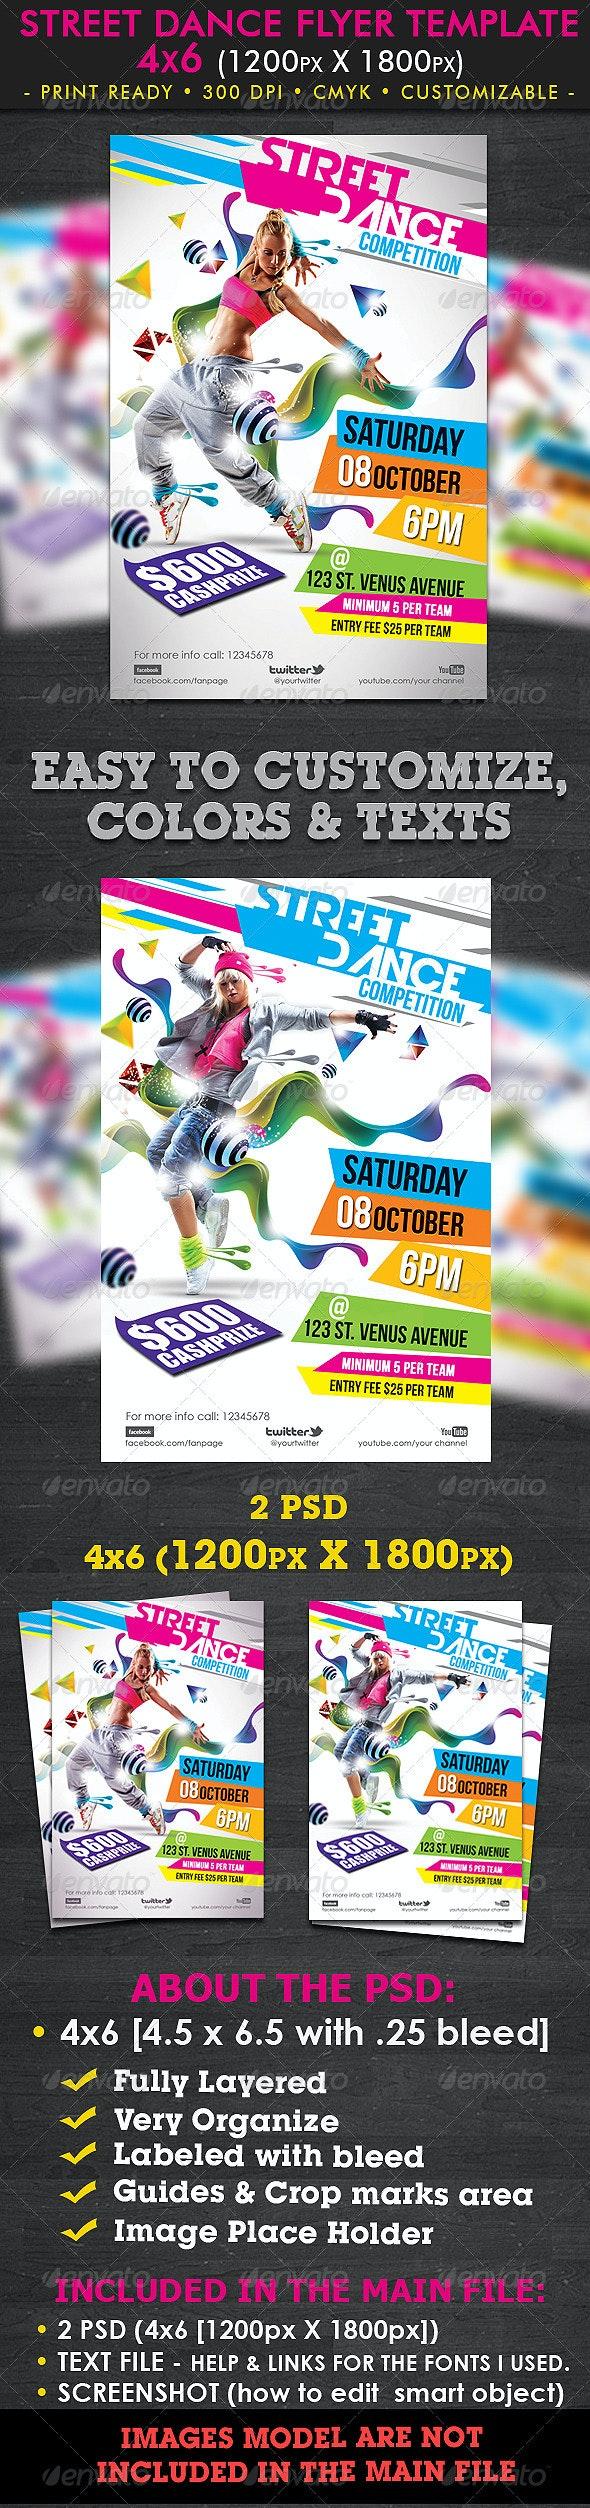 Street Dance Flyer Template - Clubs & Parties Events